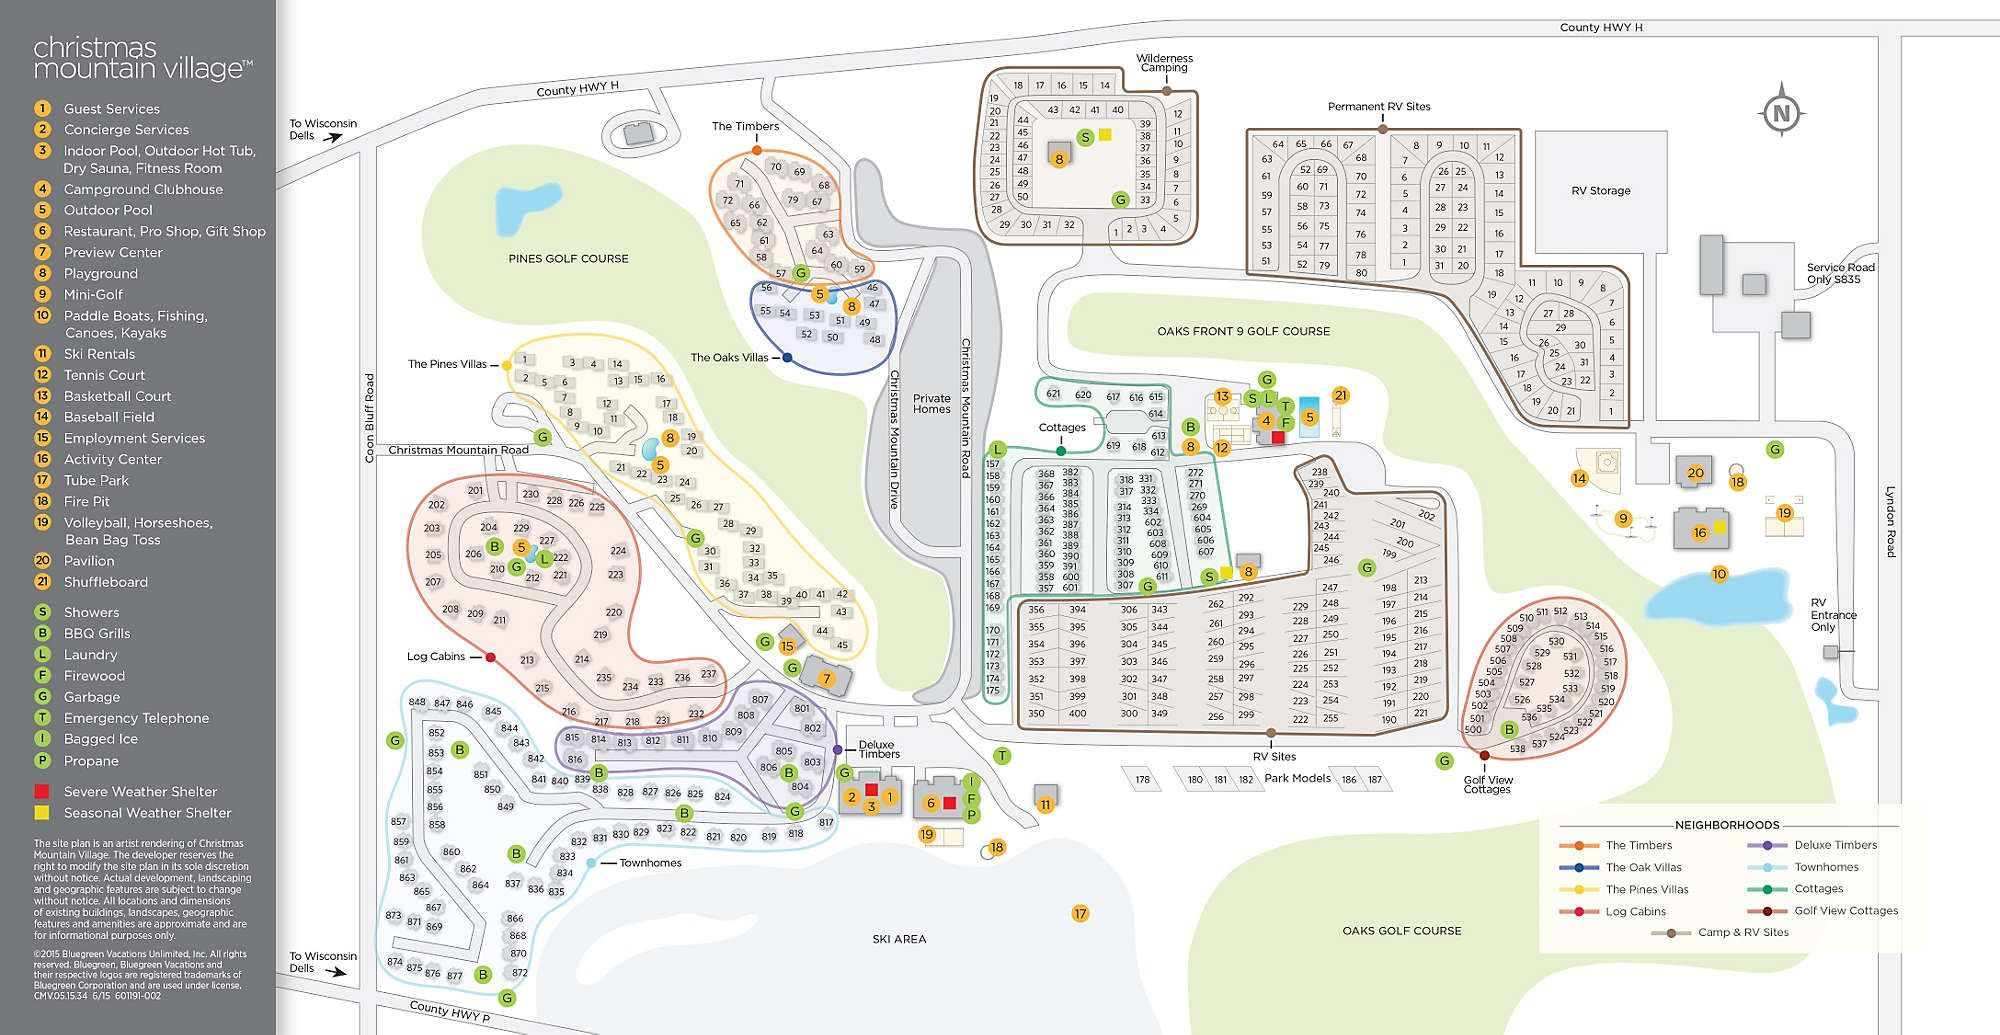 christmas mountain village site map - Bluegreen Christmas Mountain